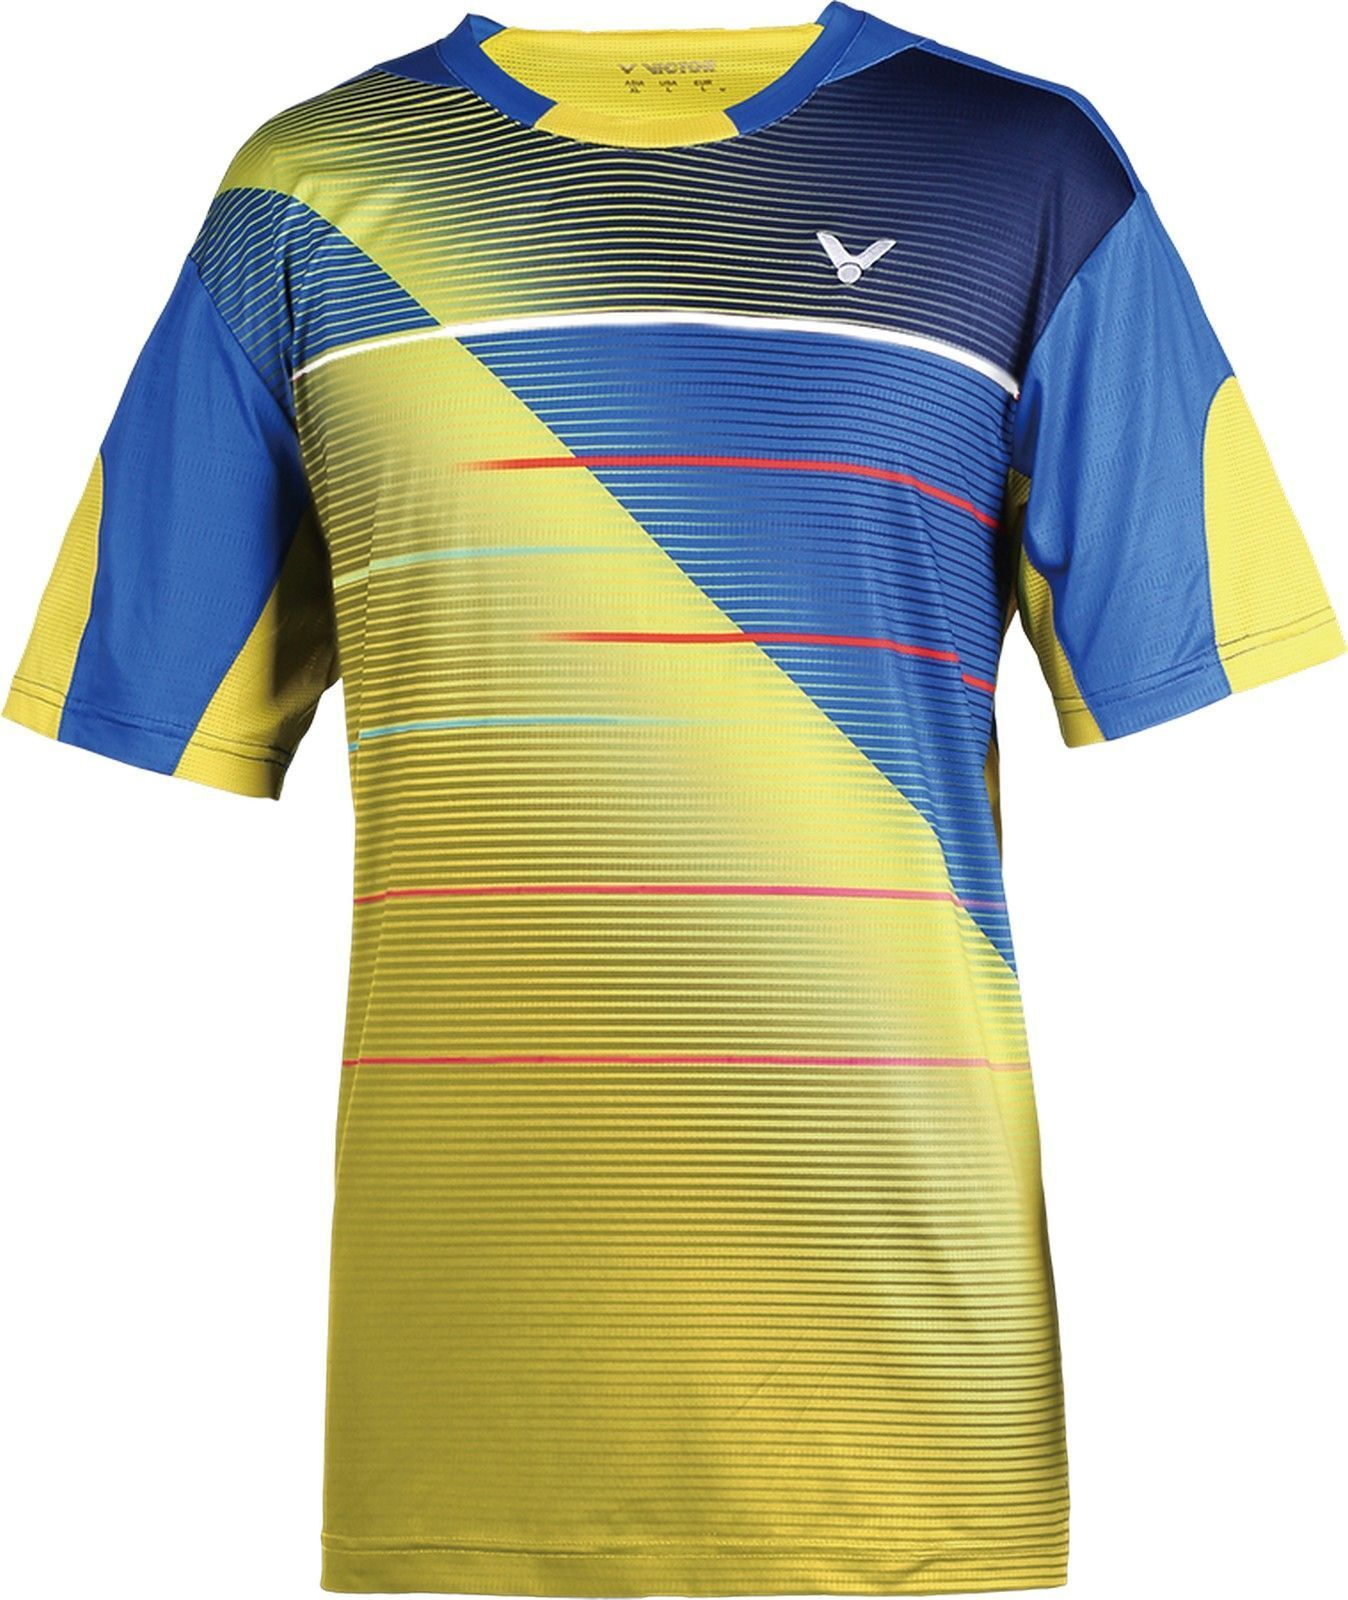 Victor Camiseta COREA Unisex Gelb 6196 NACIONAL fibra funcional Cuello